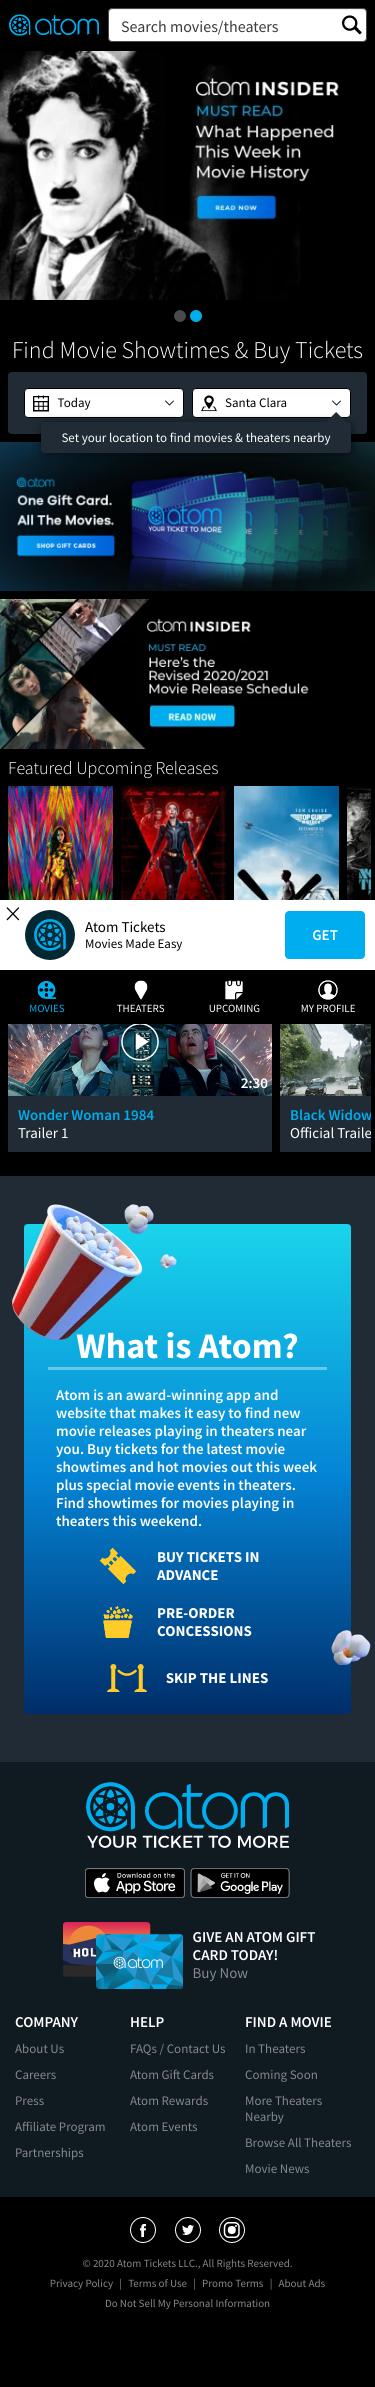 Atom Tickets Coupon